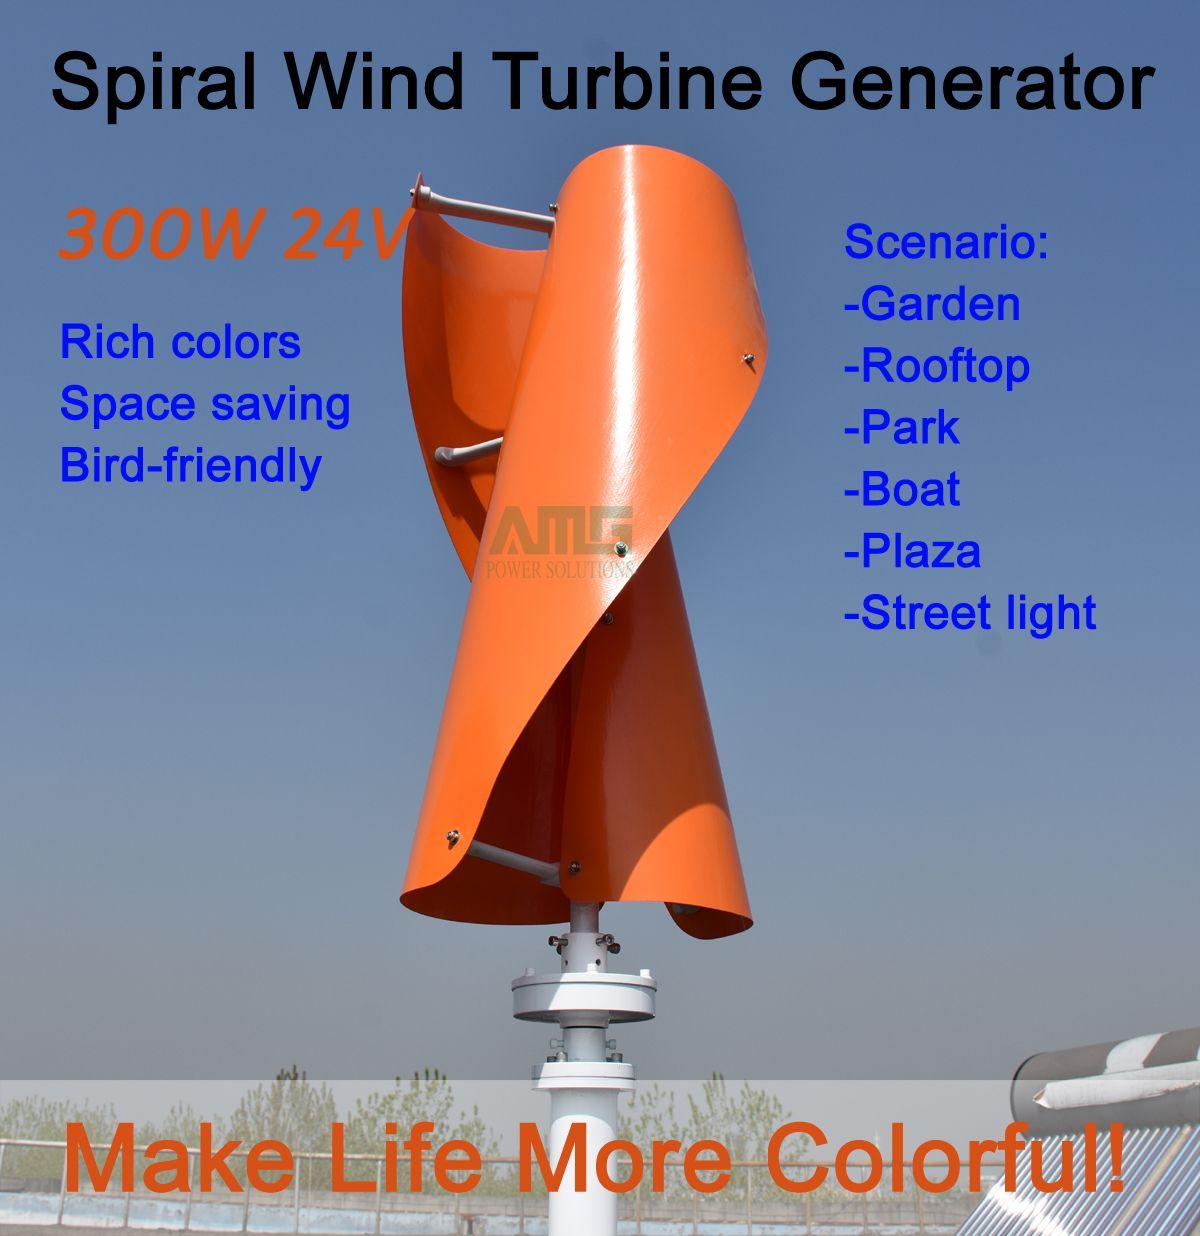 Amg 300w 24v Vertical Axis Spiral Wind Turbine Generator